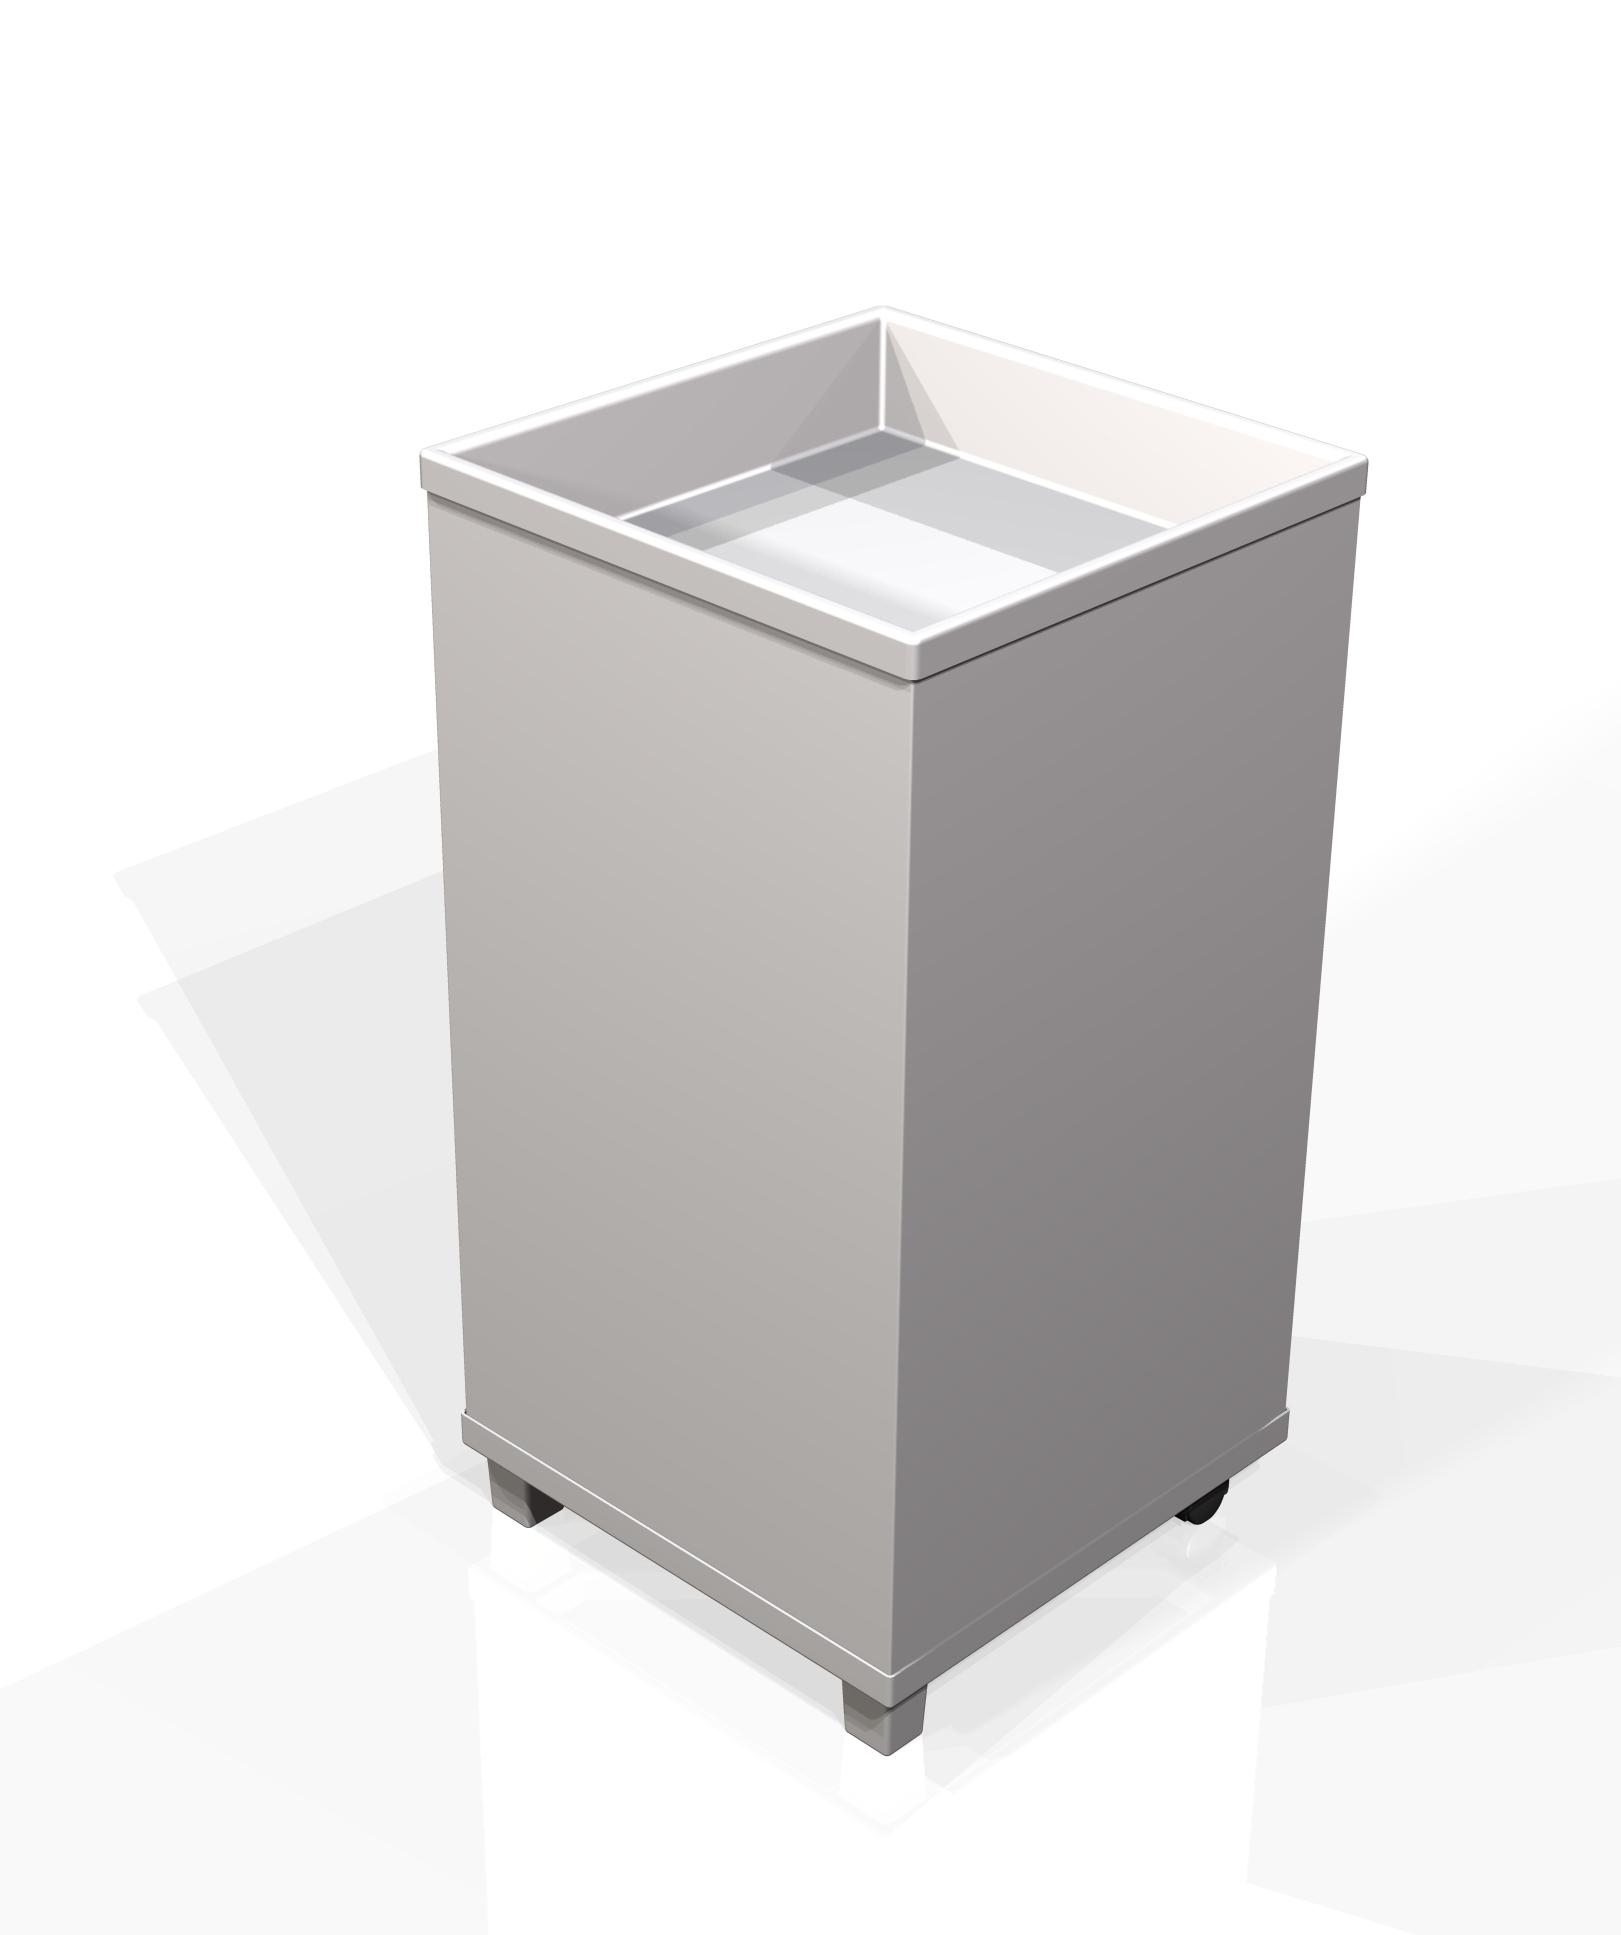 Generic open dump bin